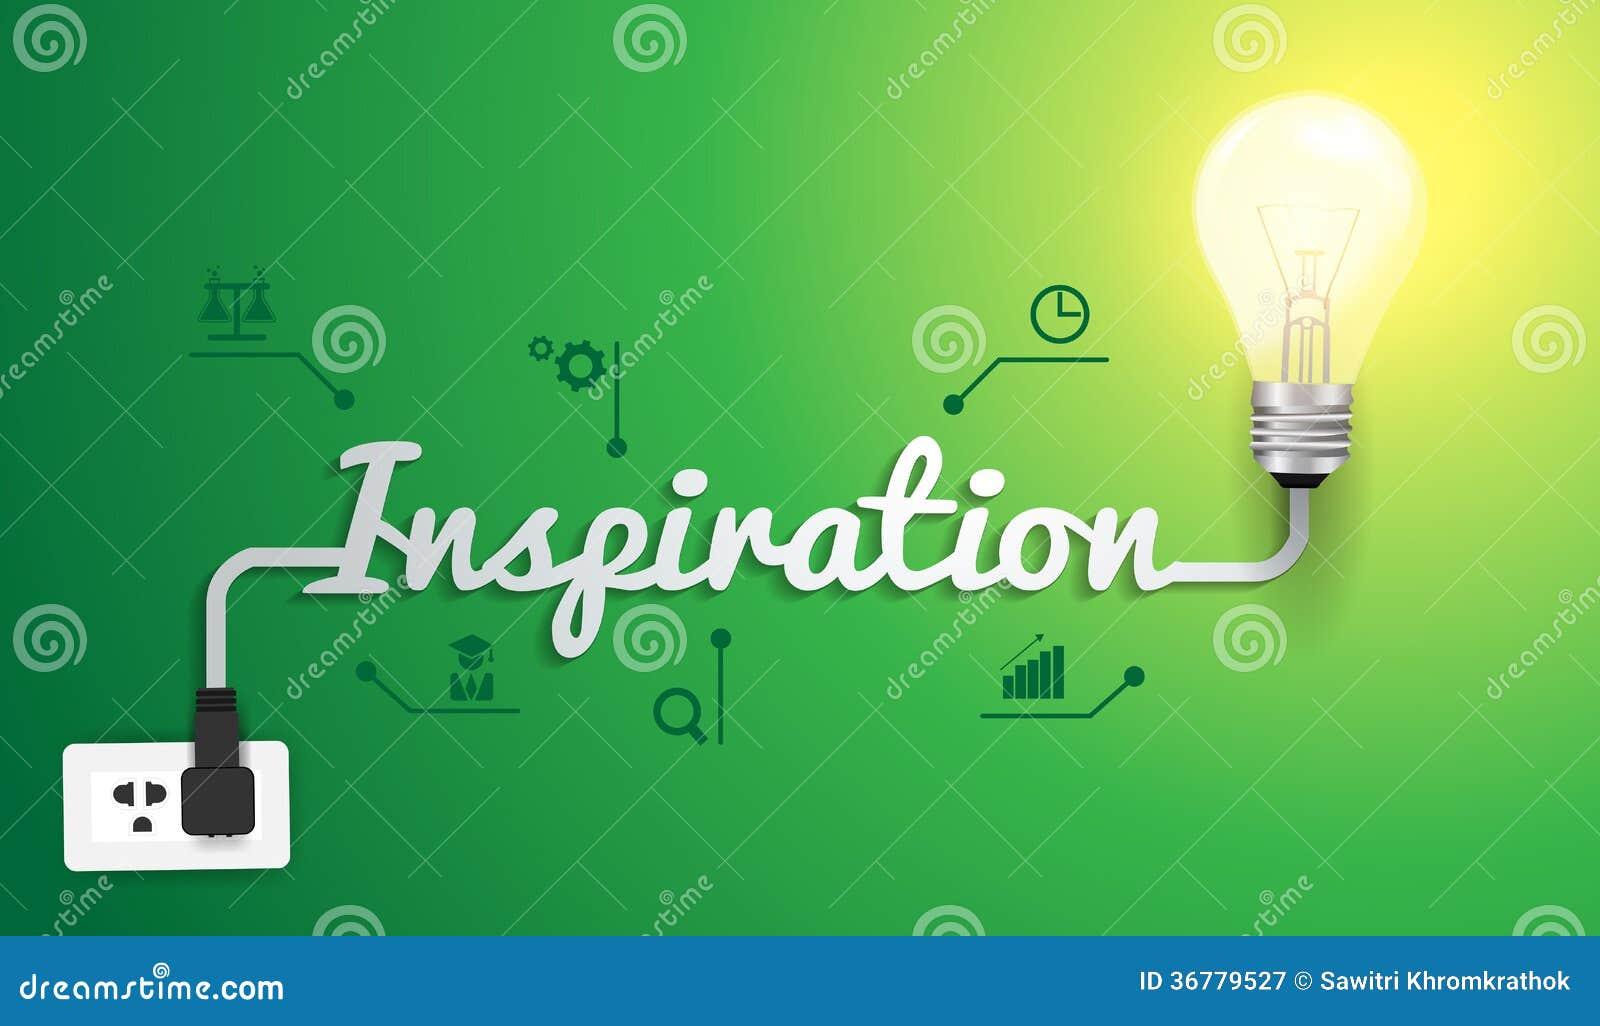 Vector inspiration concept with light bulb idea